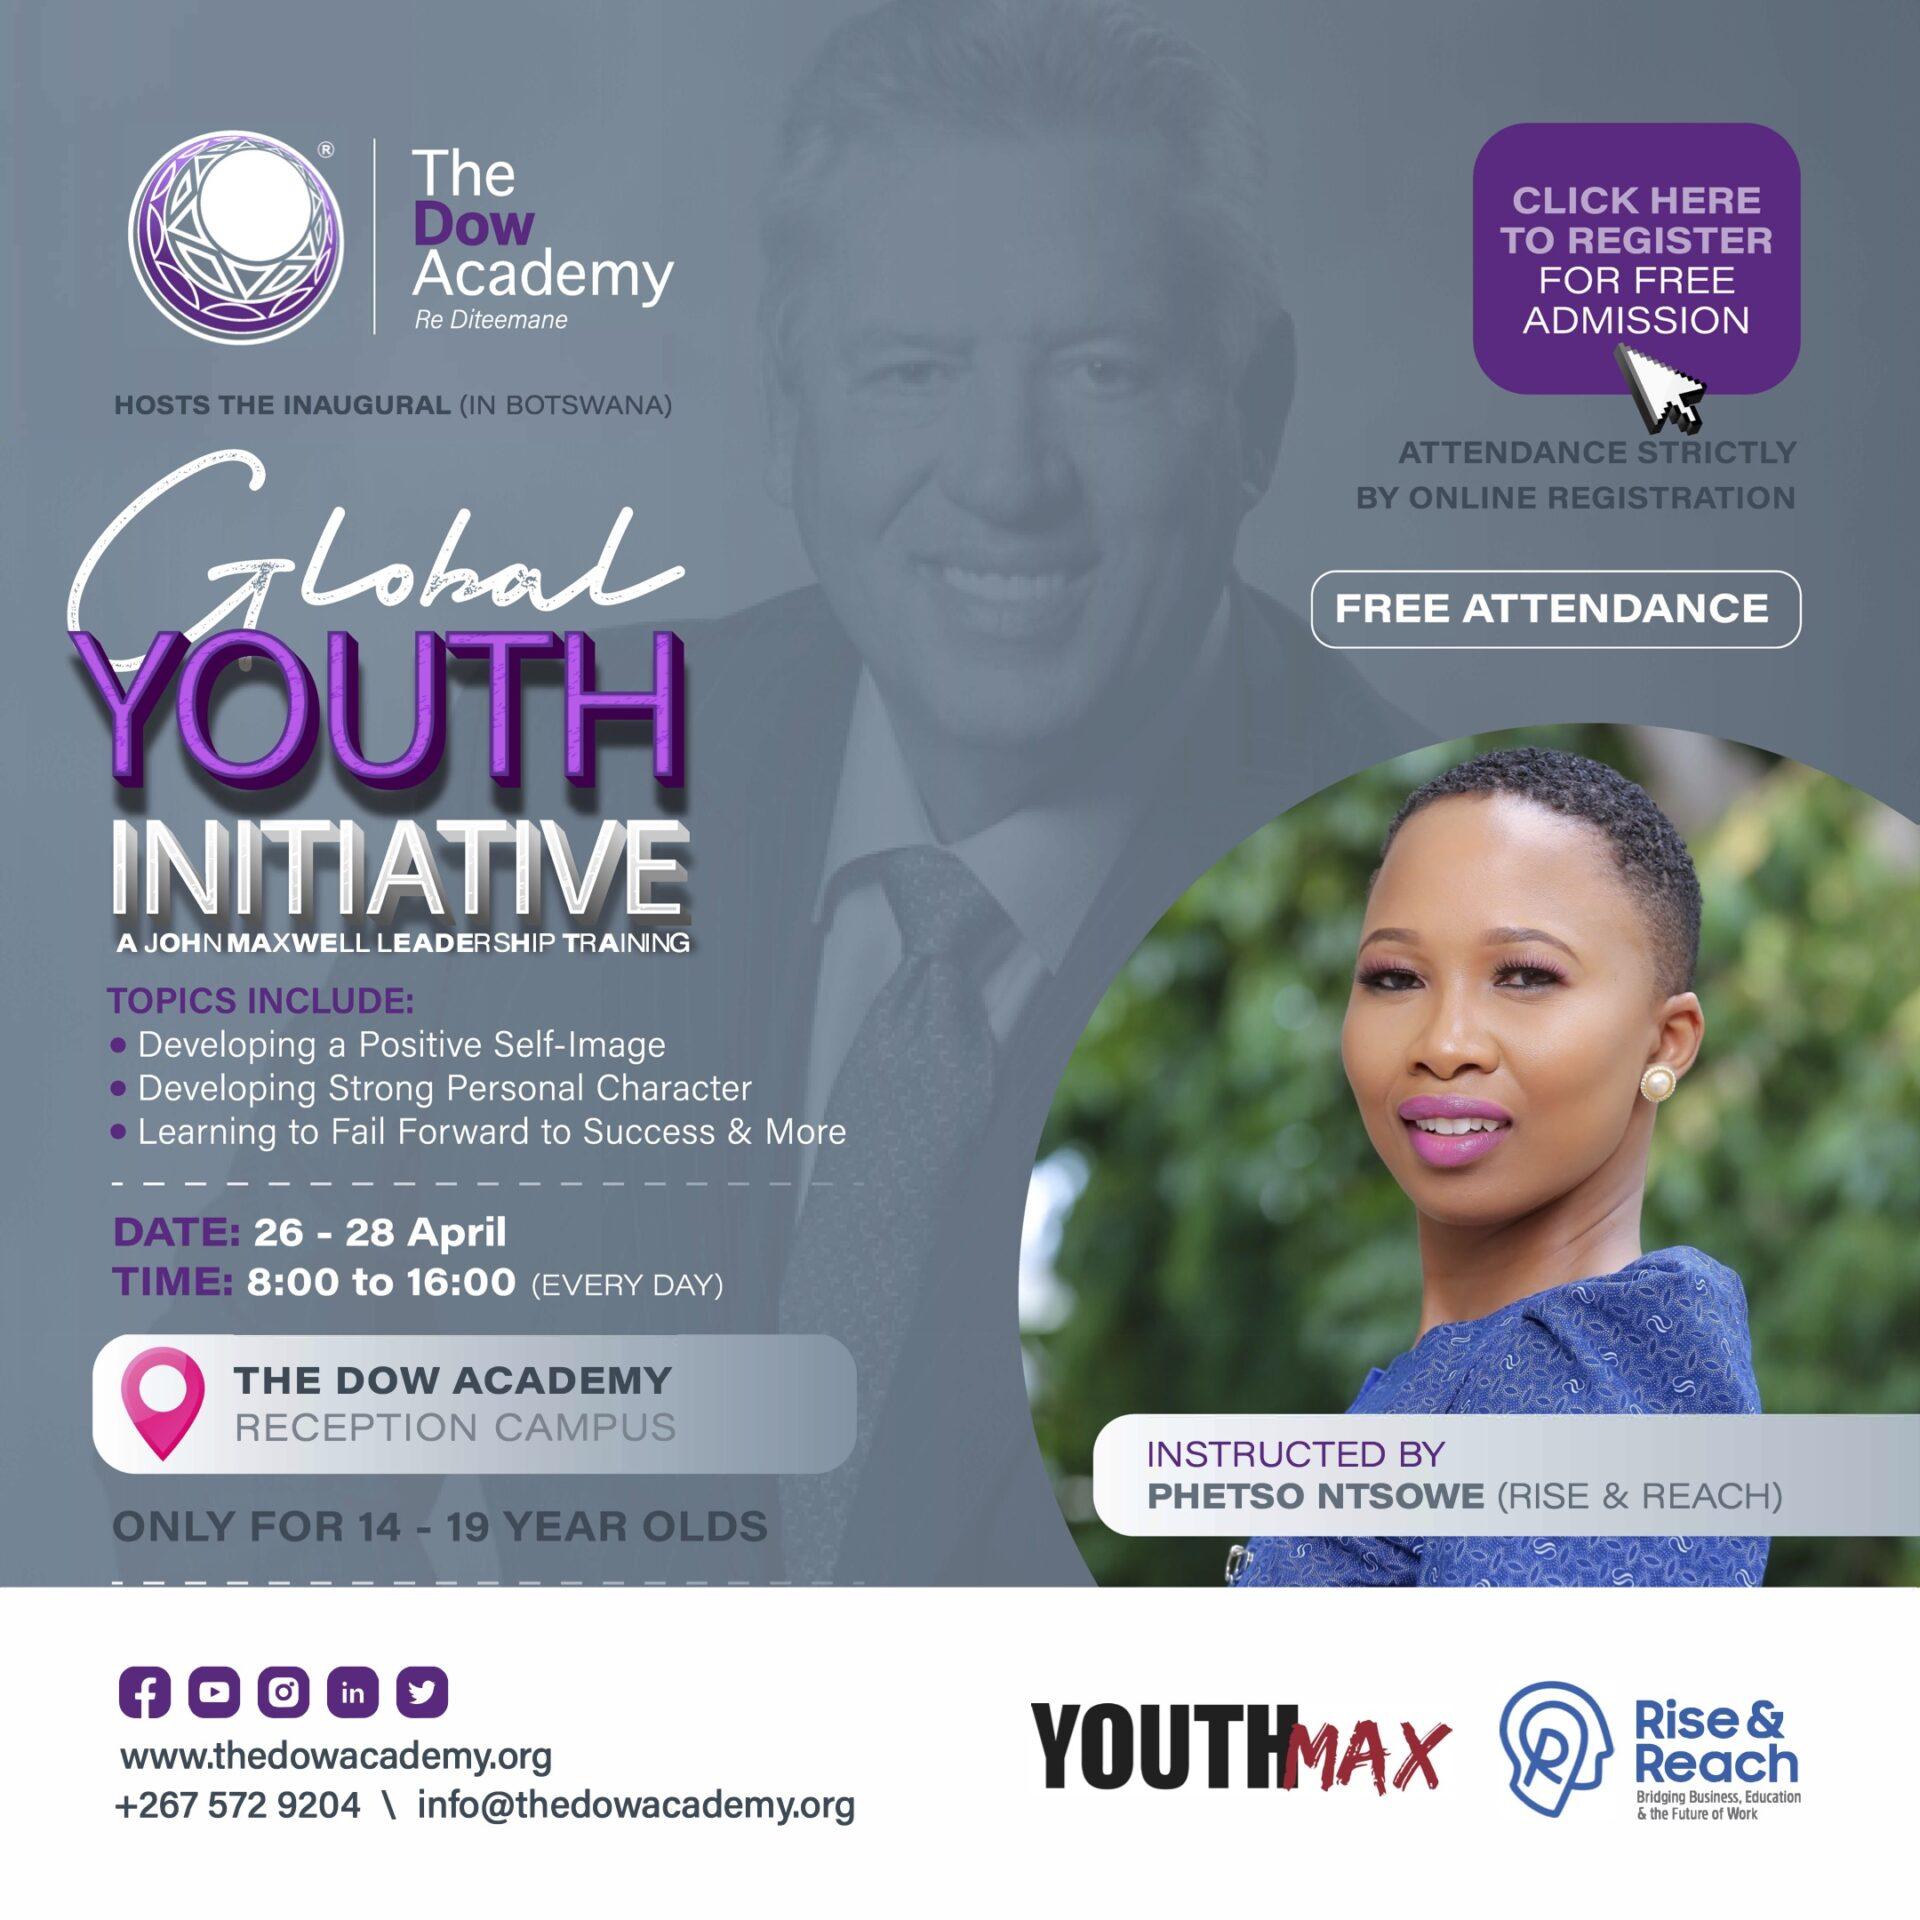 Global Youth Initiative